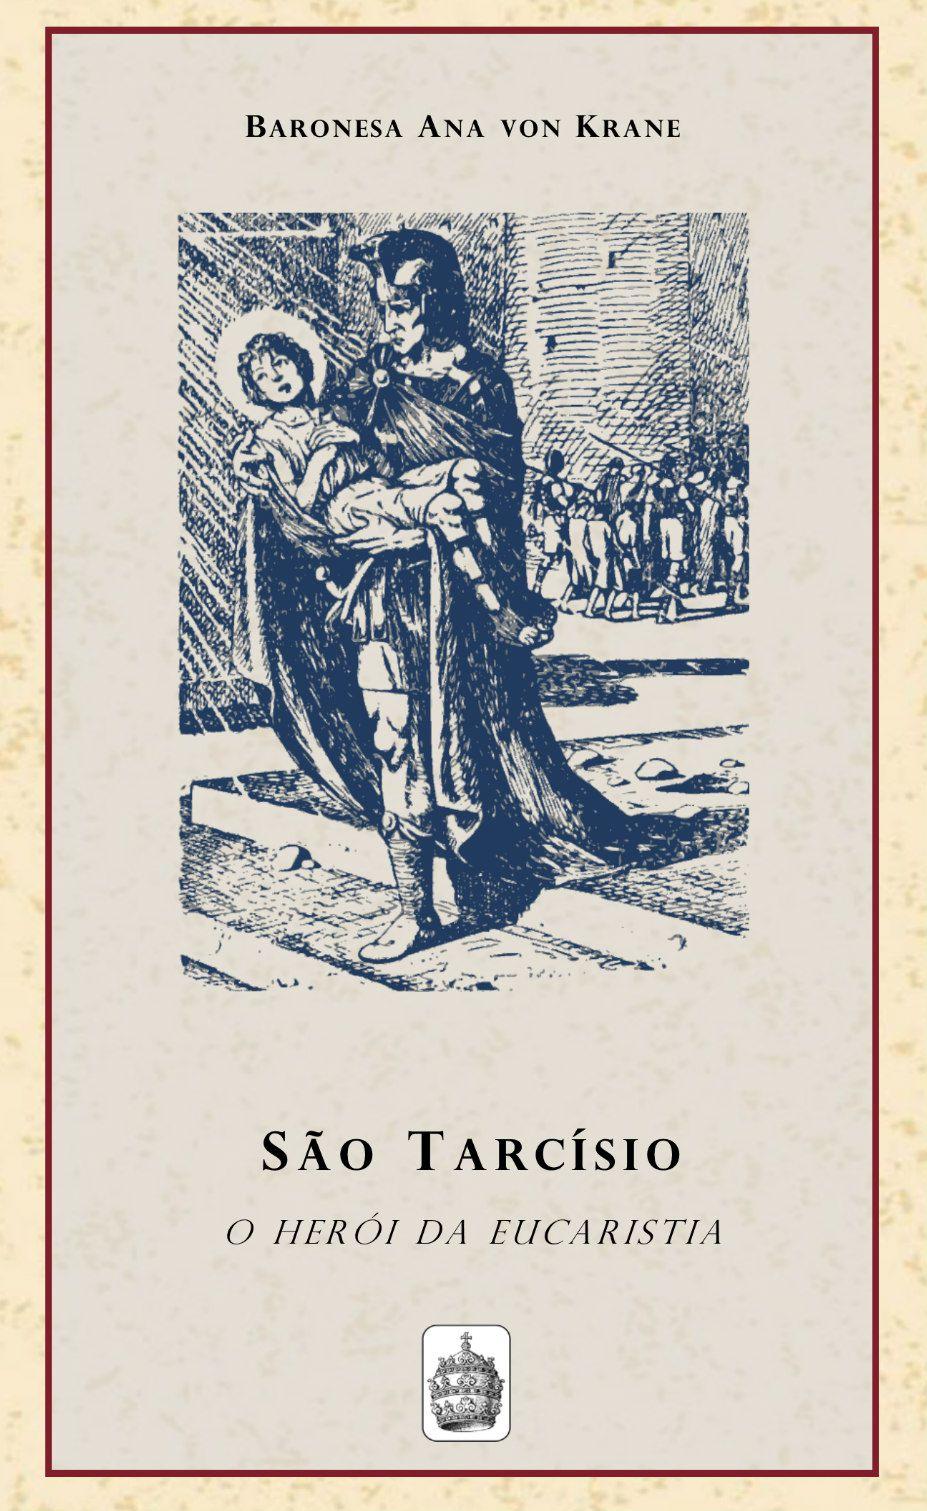 São Tarcísio, o Herói da Eucaristia - Baronesa Ana von Krane  - Livraria Santa Cruz